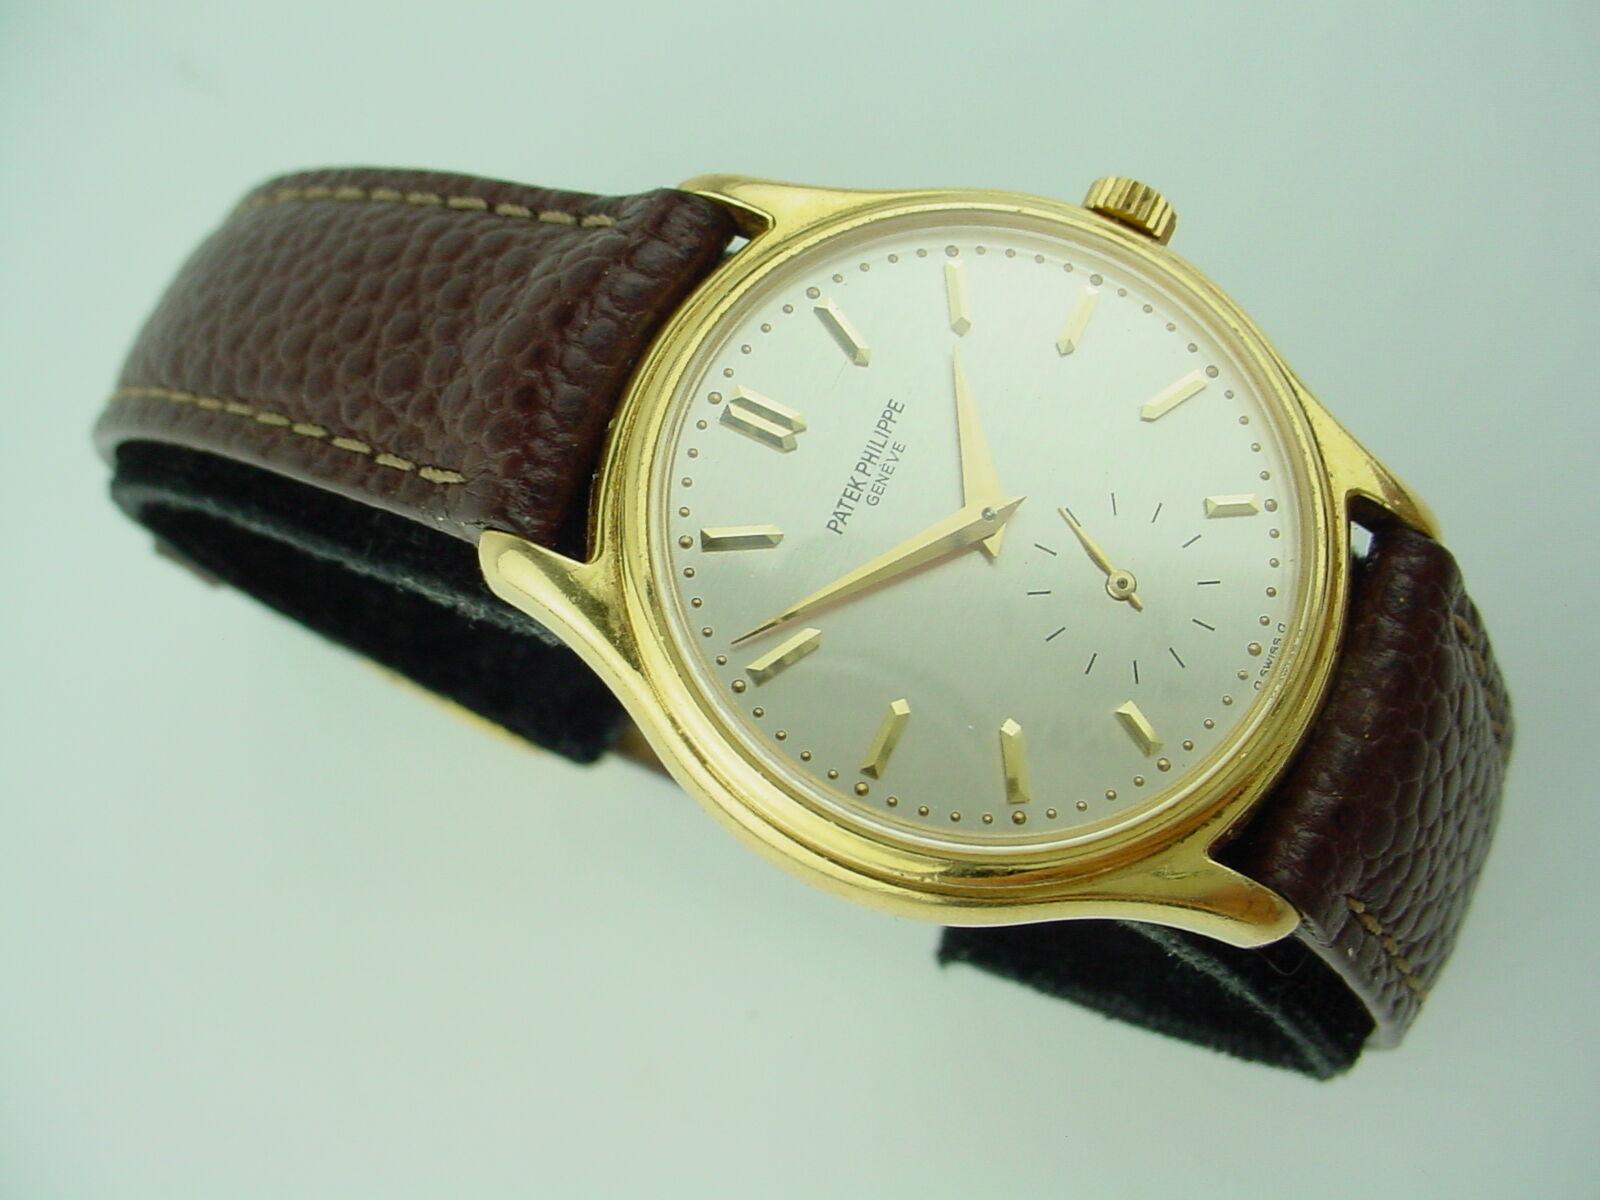 $7149.45 - Patek Philippe Calatrava 215 Hand-winding 18K Yellow Gold Vintage Watch 31mm